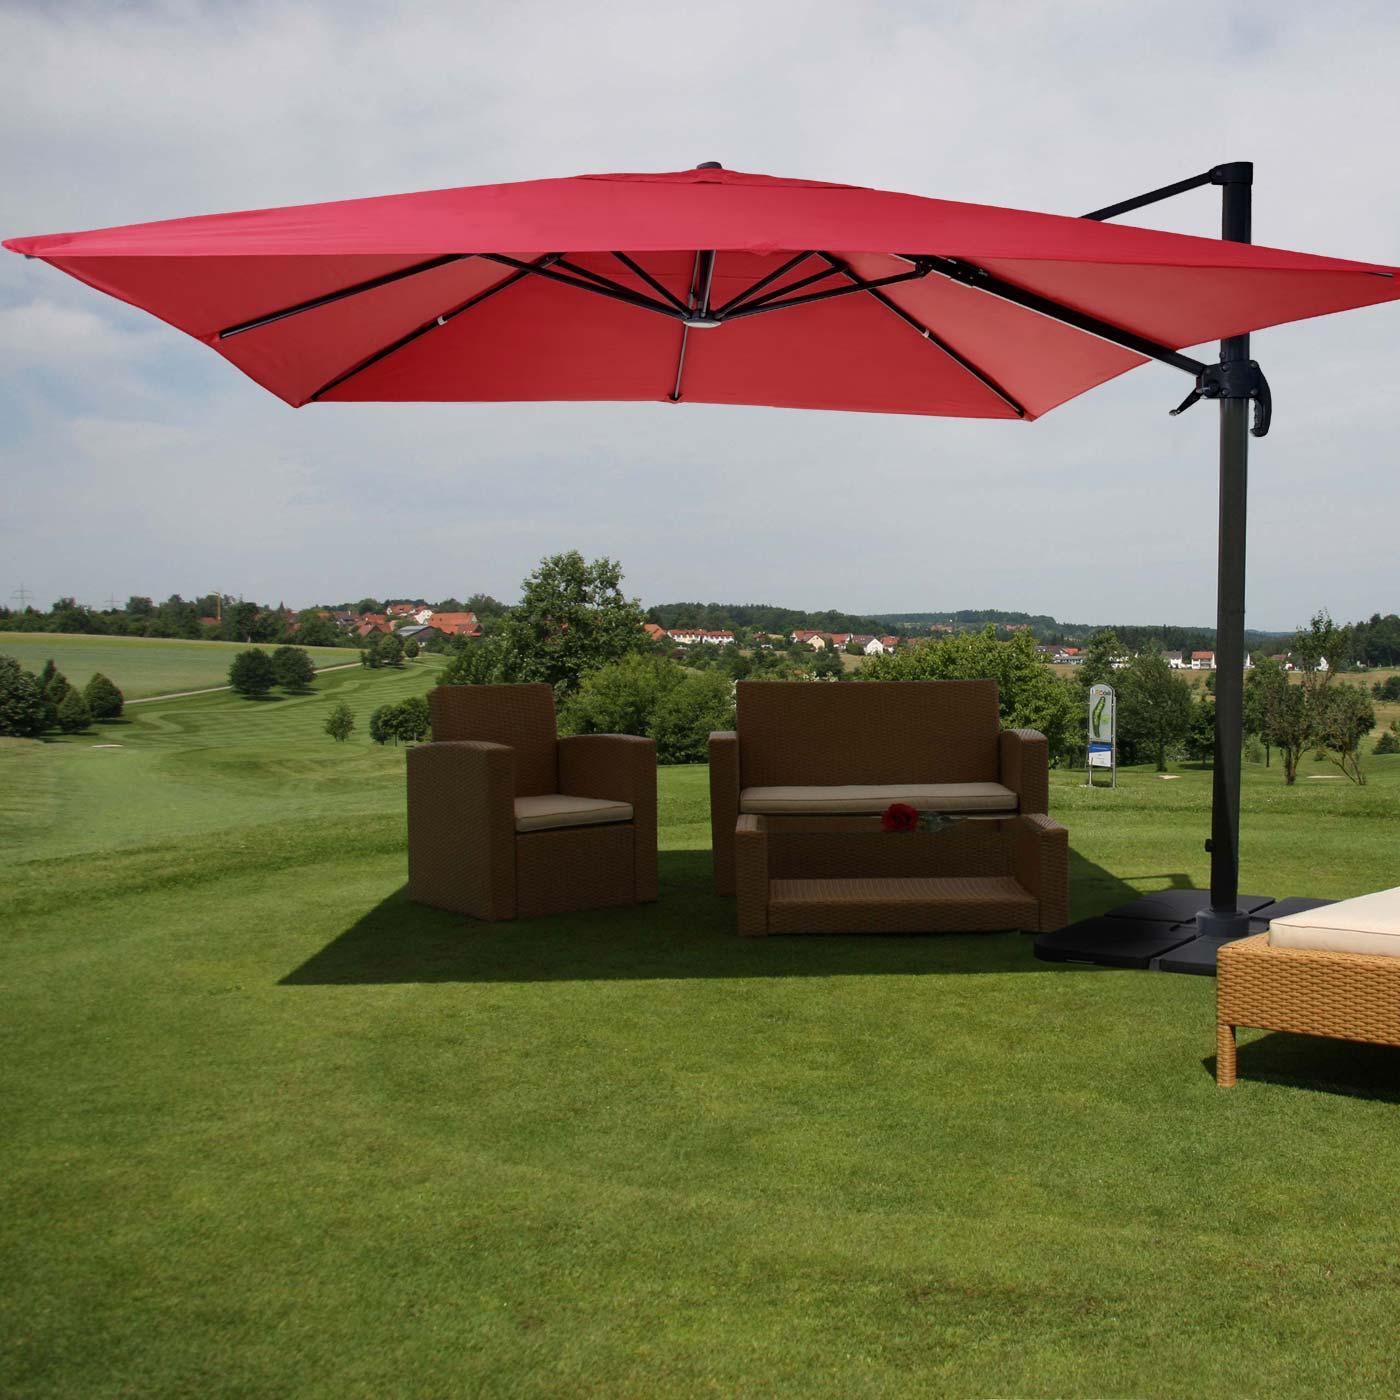 gastronomie luxus ampelschirm hwc sonnenschirm 3x3m rot. Black Bedroom Furniture Sets. Home Design Ideas